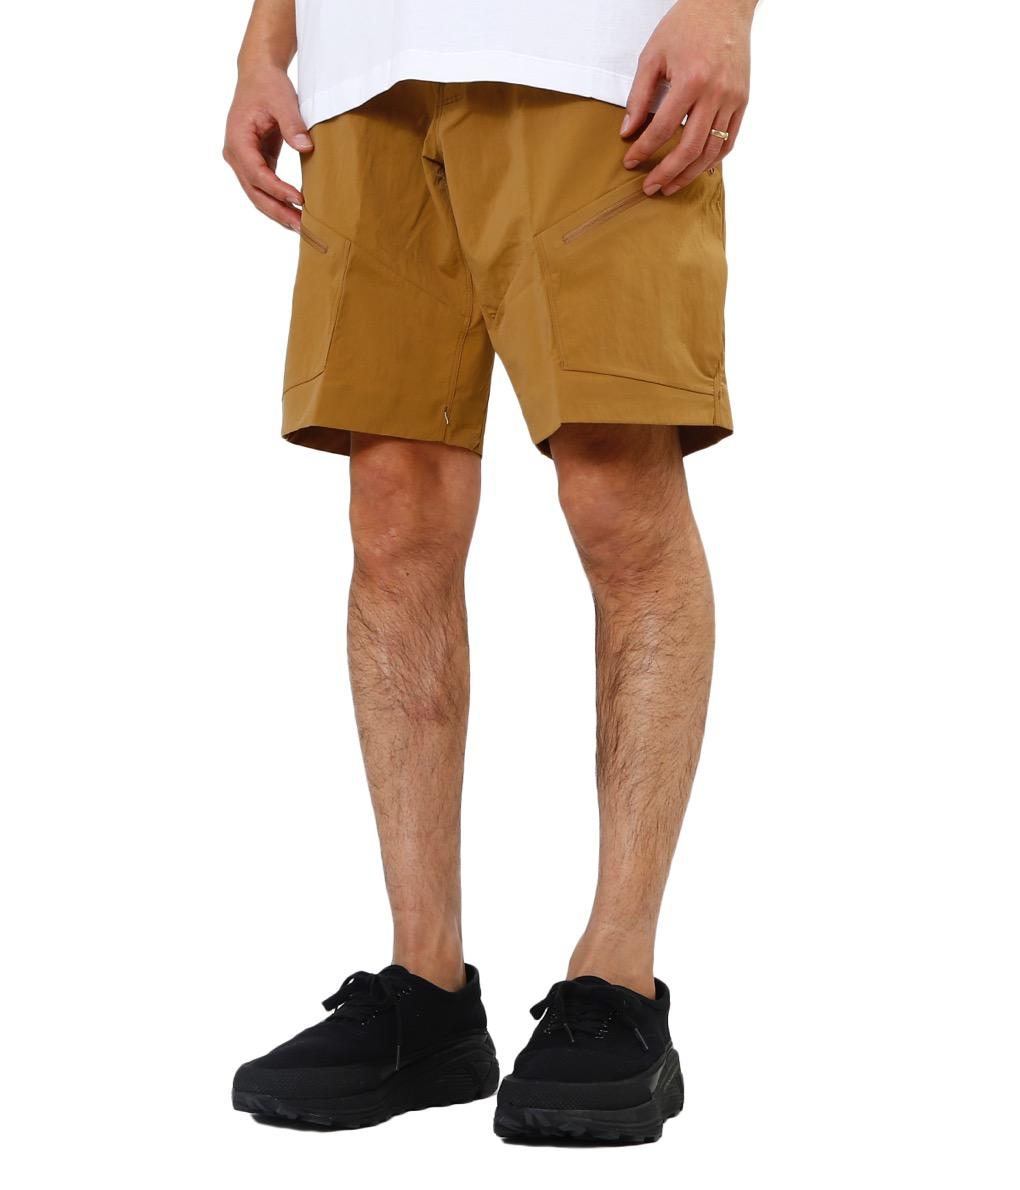 ARC'TERYX / アークテリクス : Palisade Short Men's -Elk- : アークテリクス パリセイドショーツ ロングパンツ ボトム ショーツ ショートパンツ : L07311100 【REA】【STD】